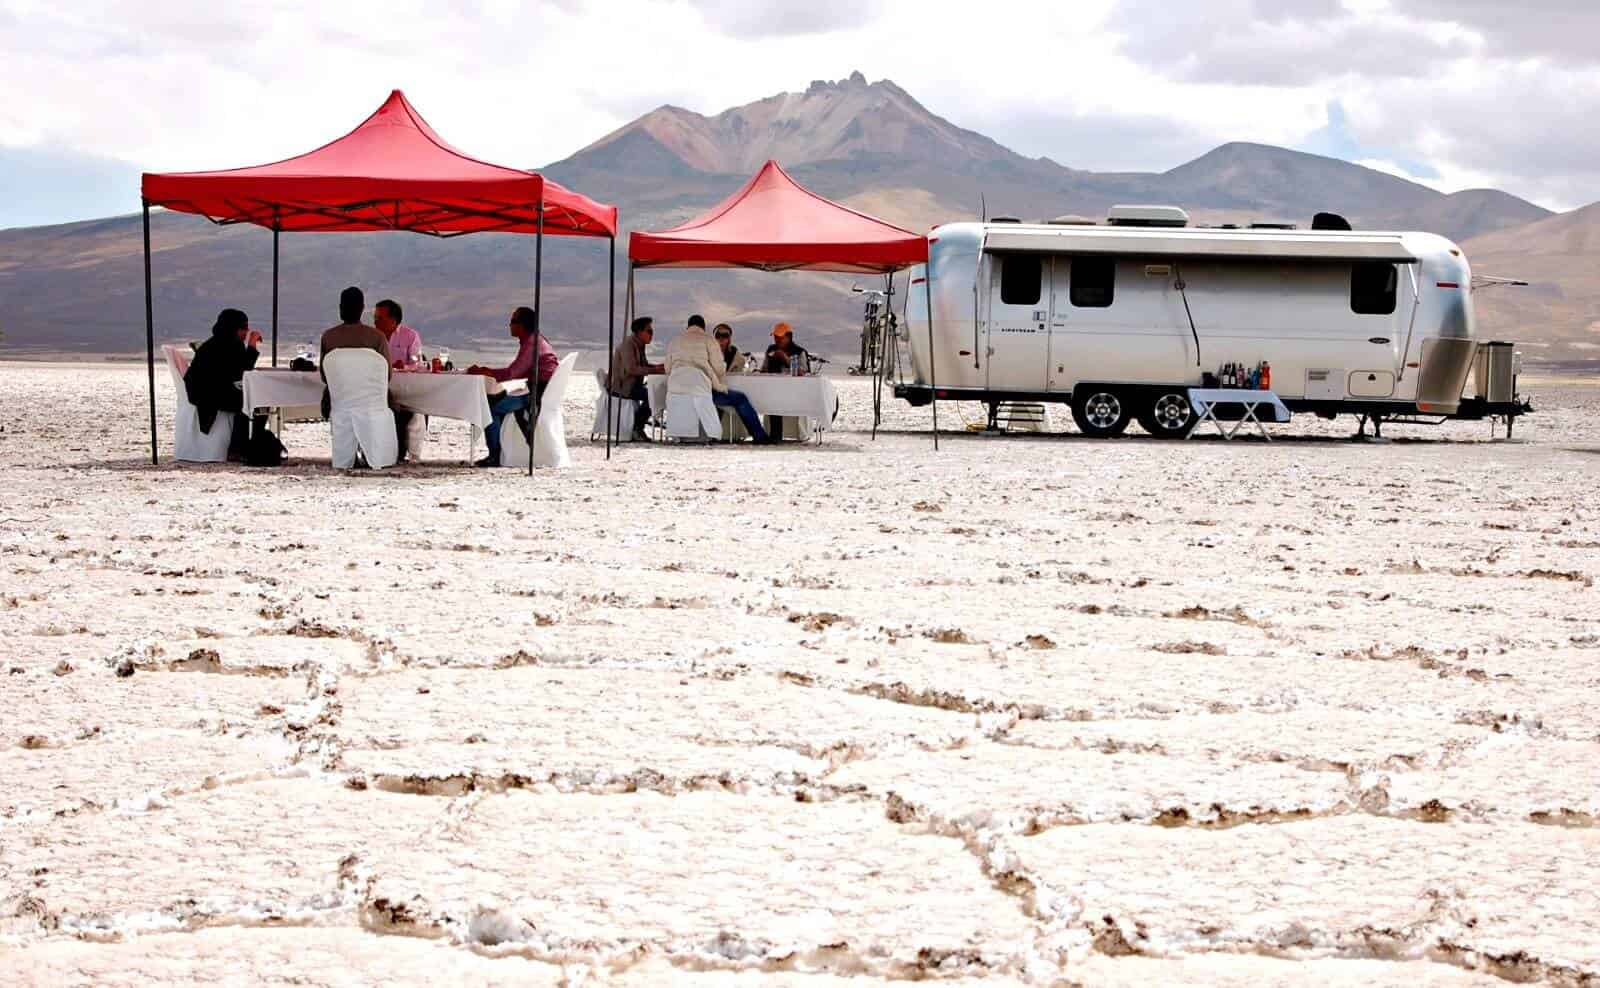 bolivien_Salar_de_Uyuni_air-stream-camper10